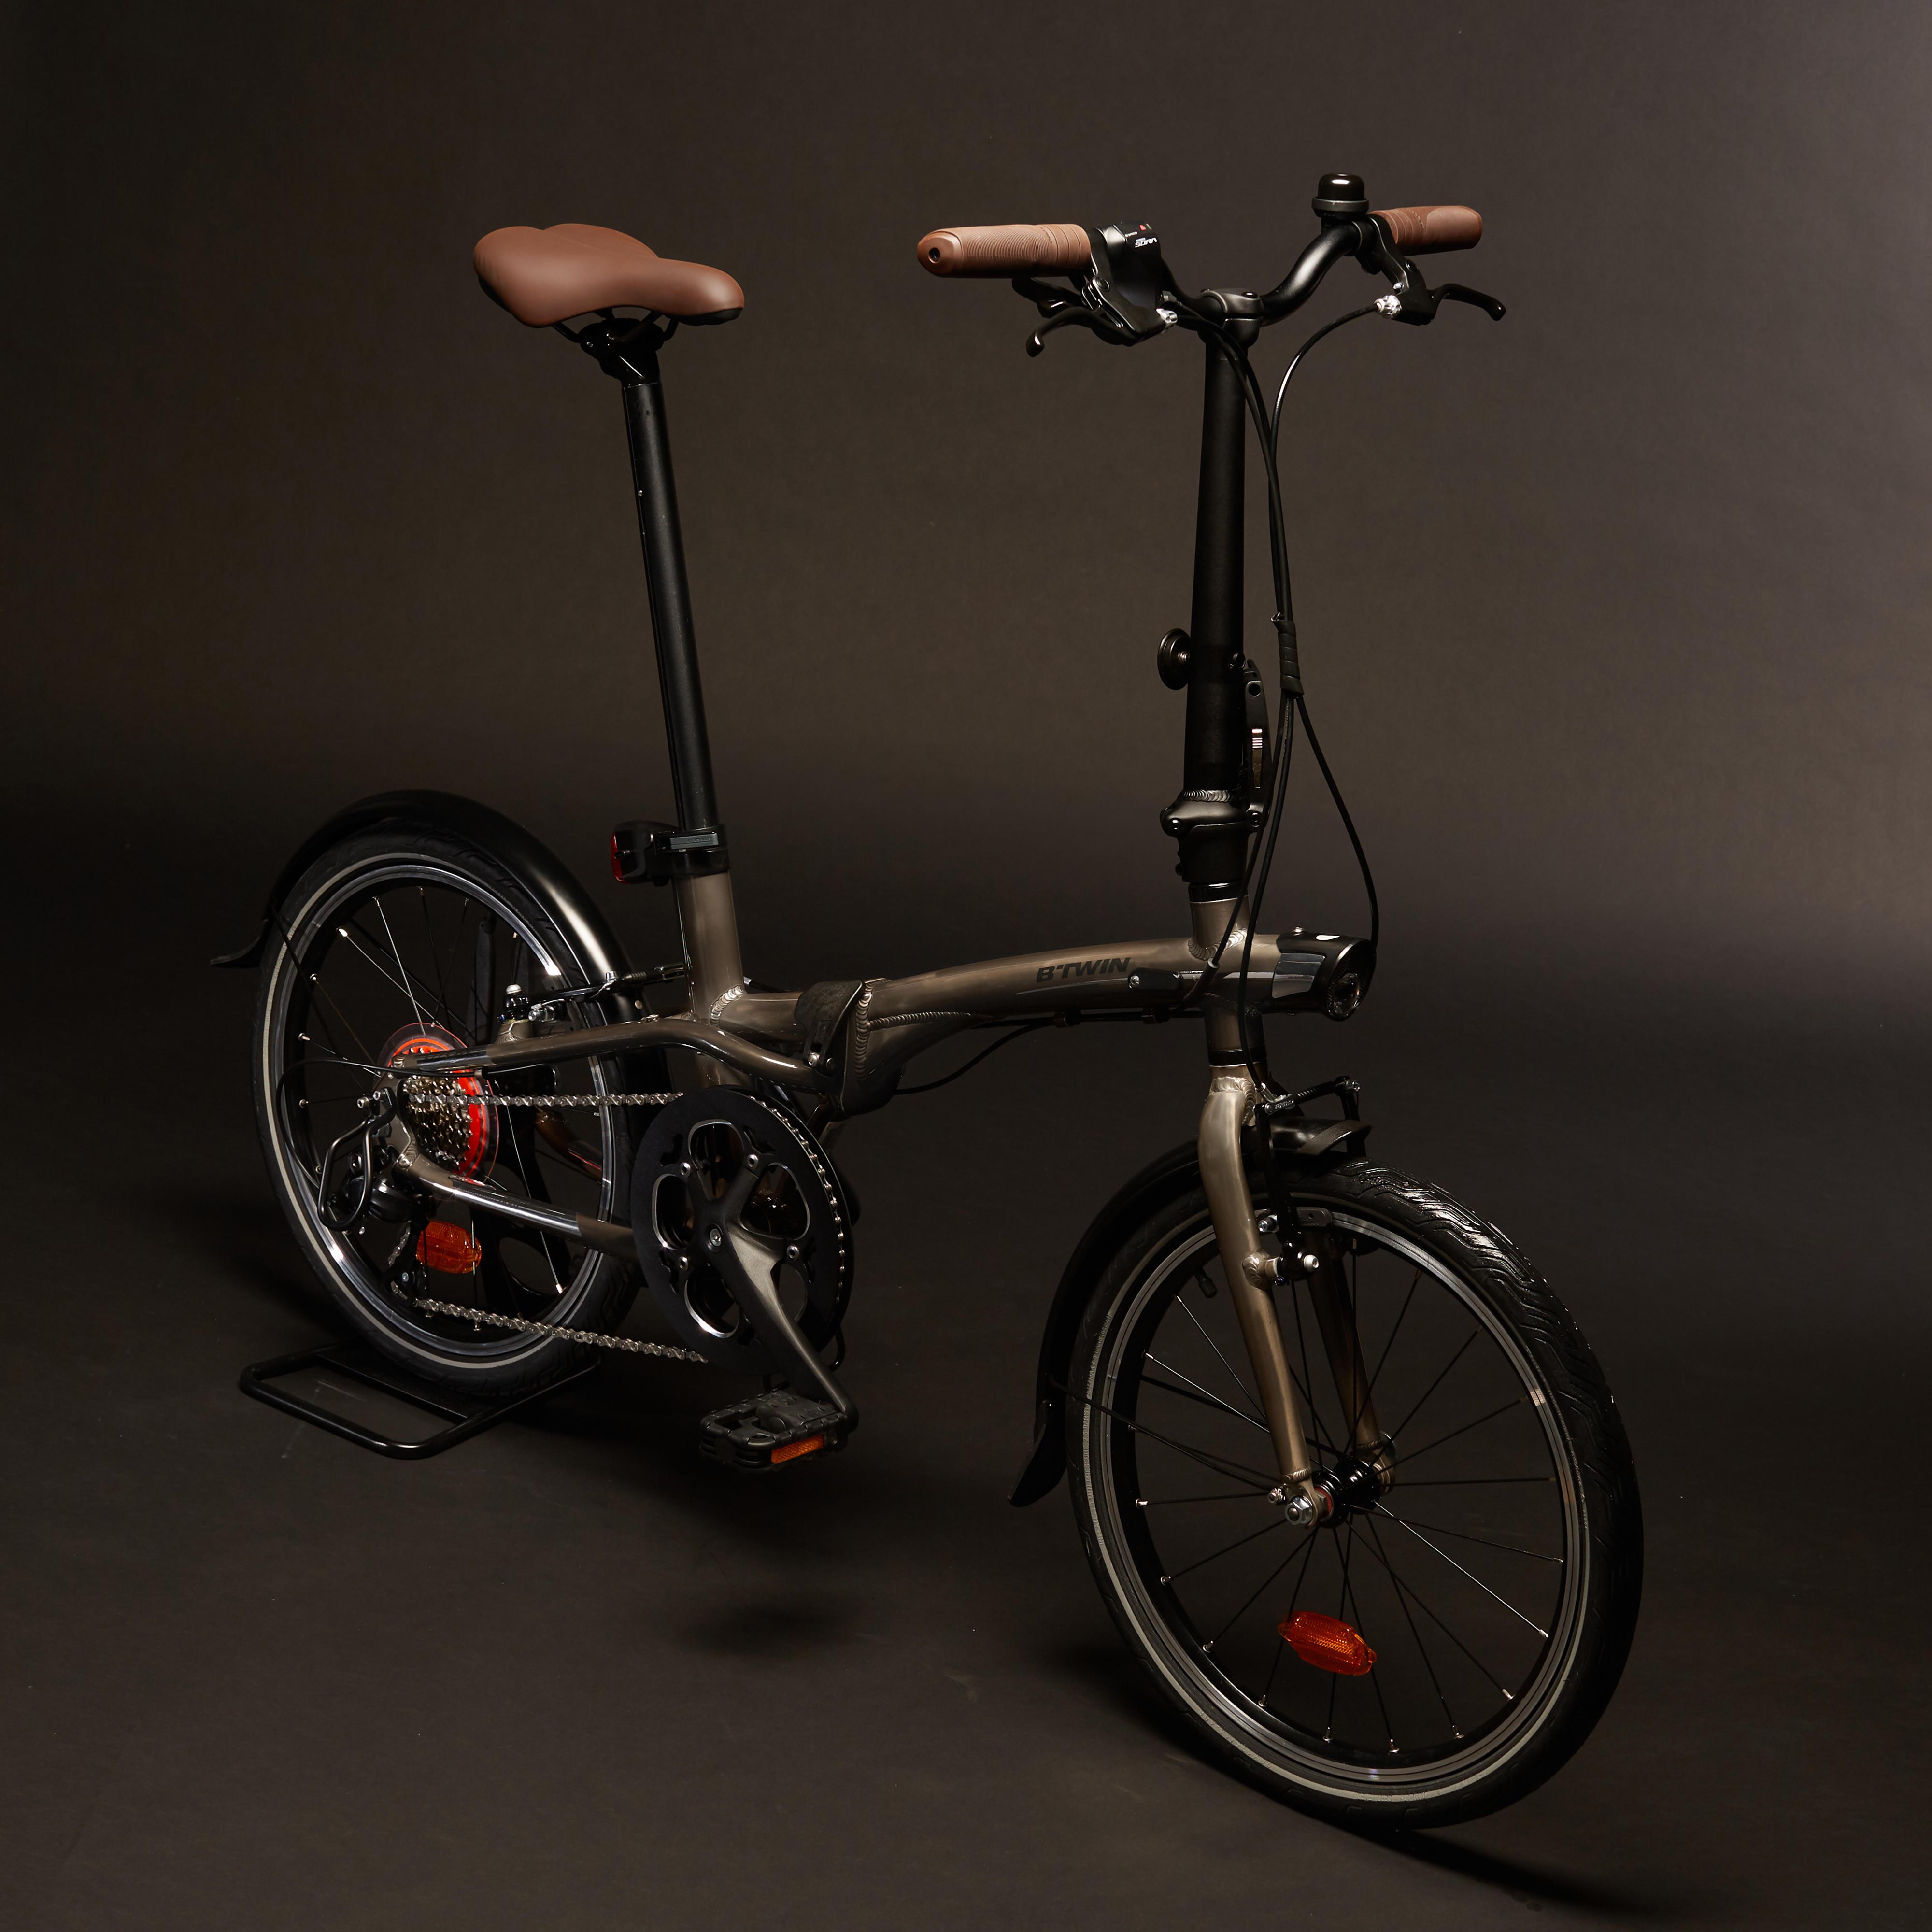 skladnoj-velosiped-tilt-900-.jpg